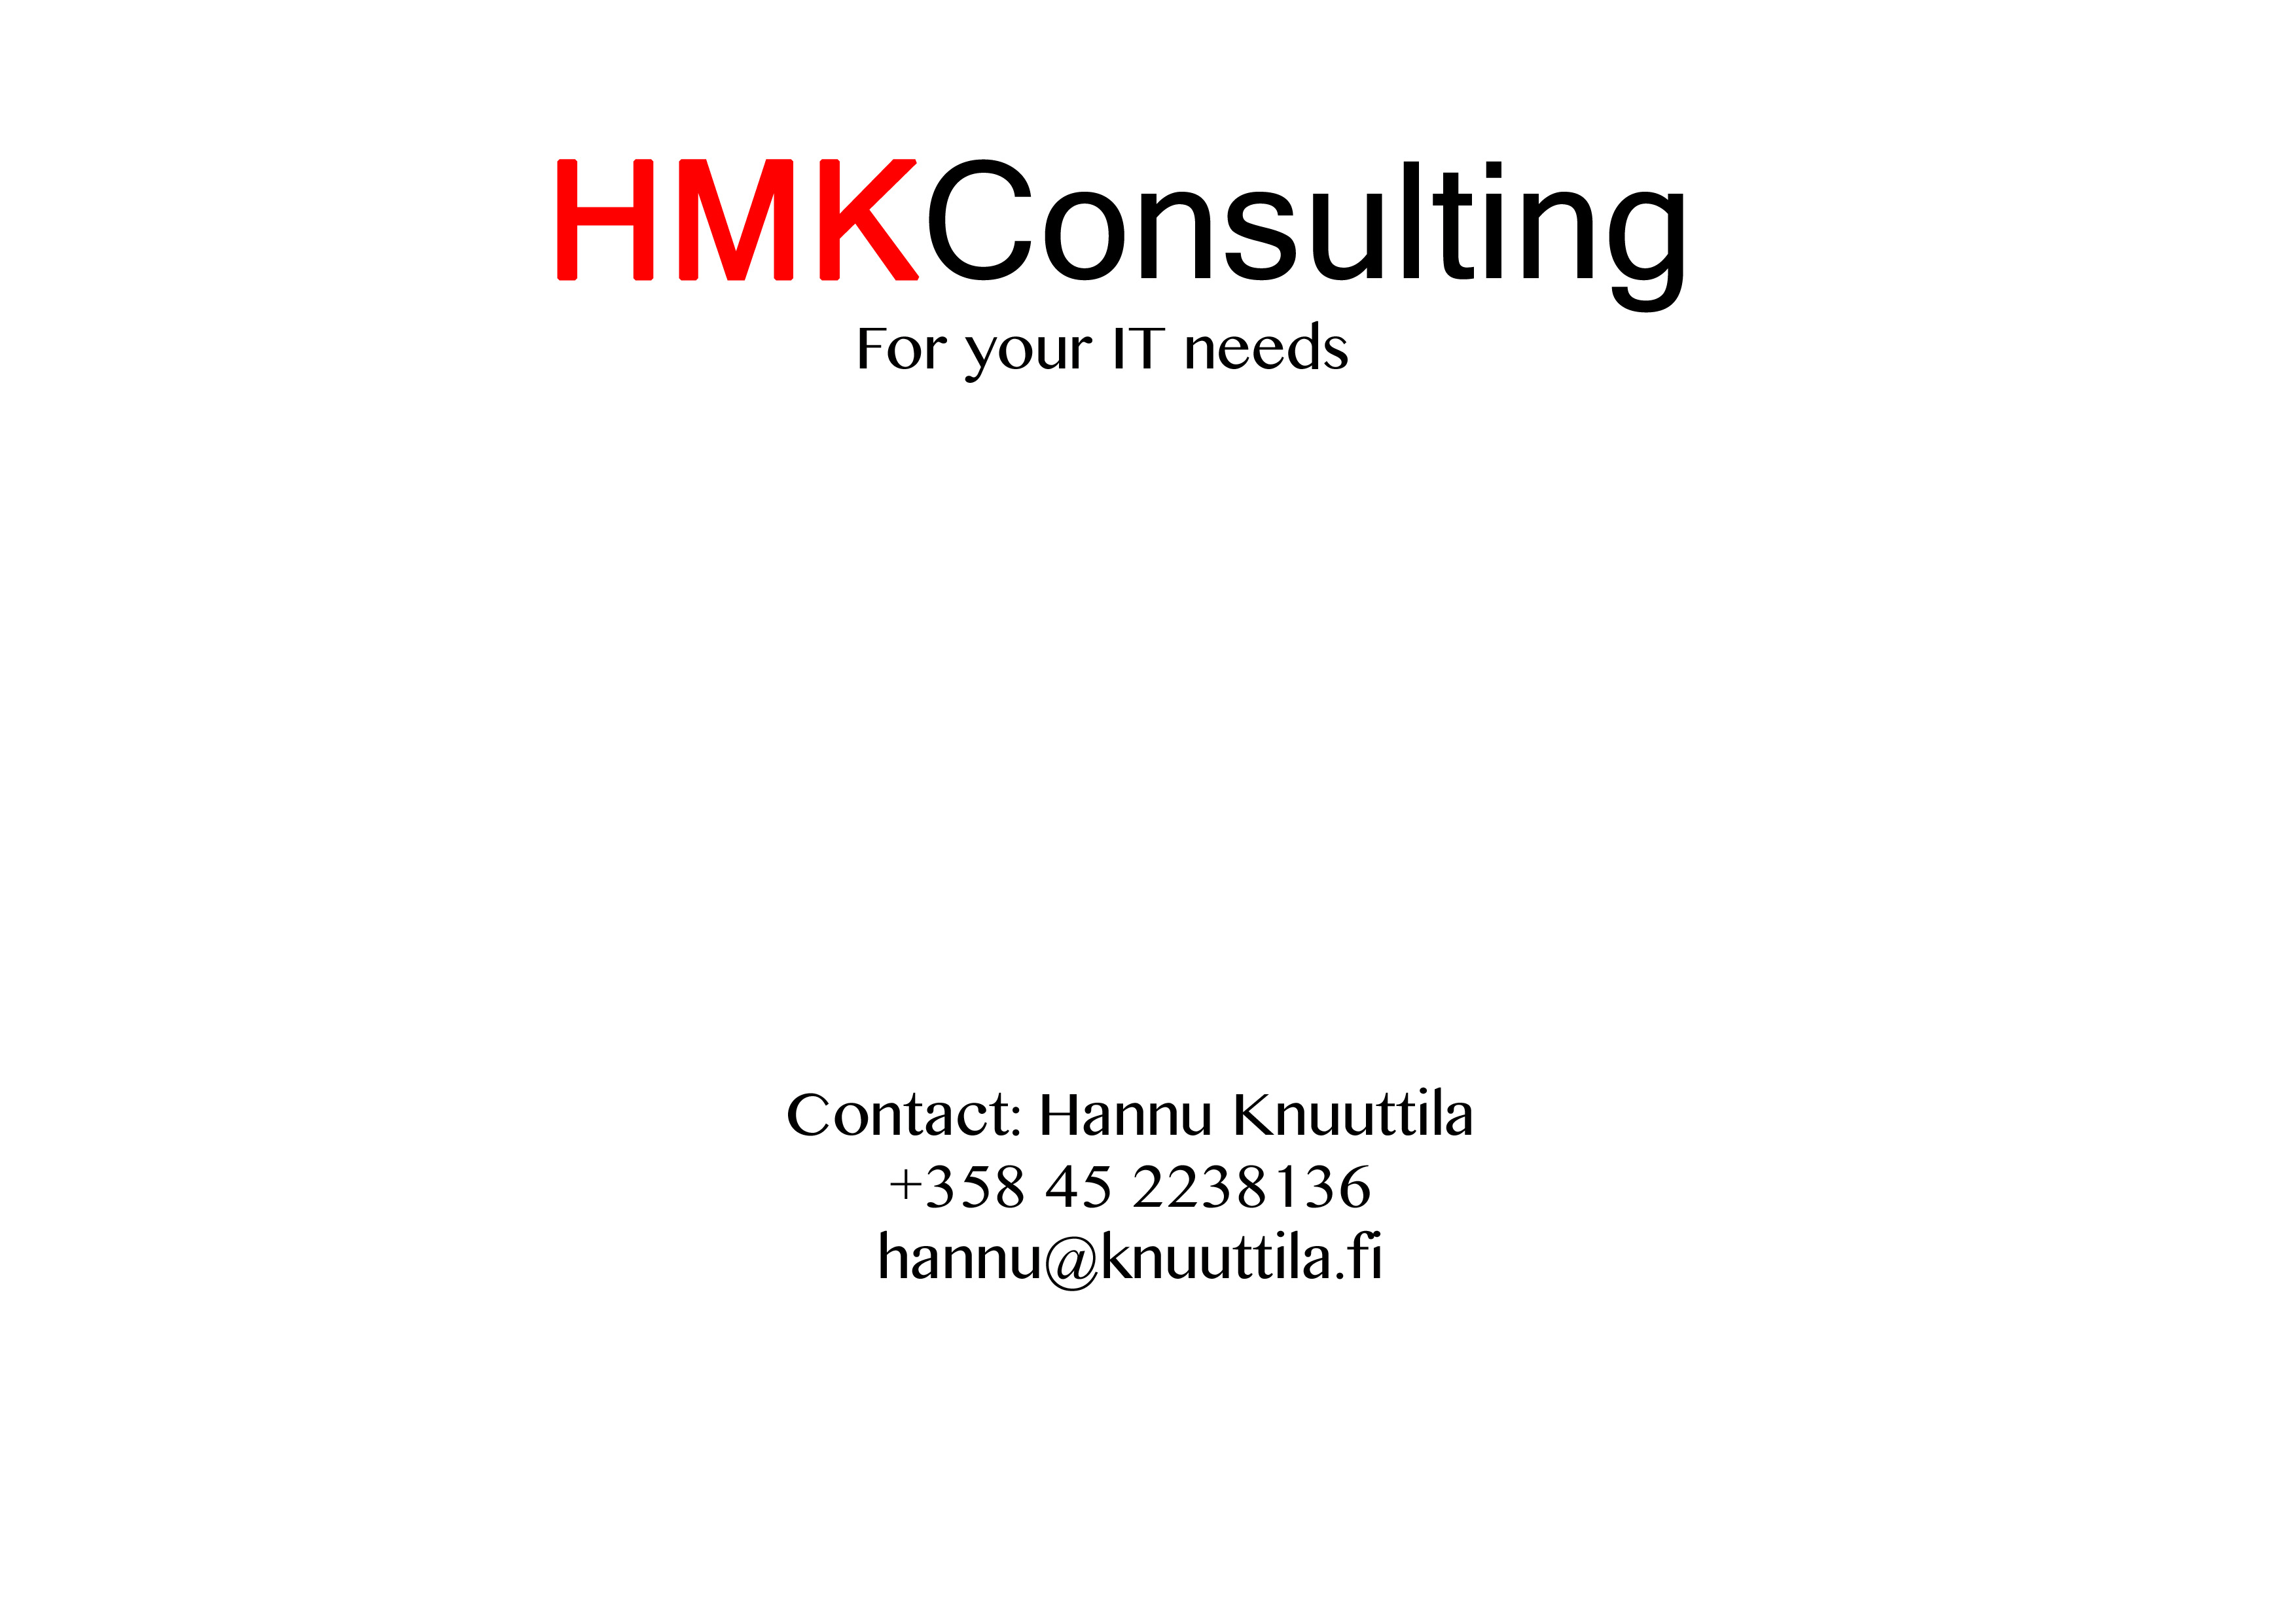 HMK Consulting